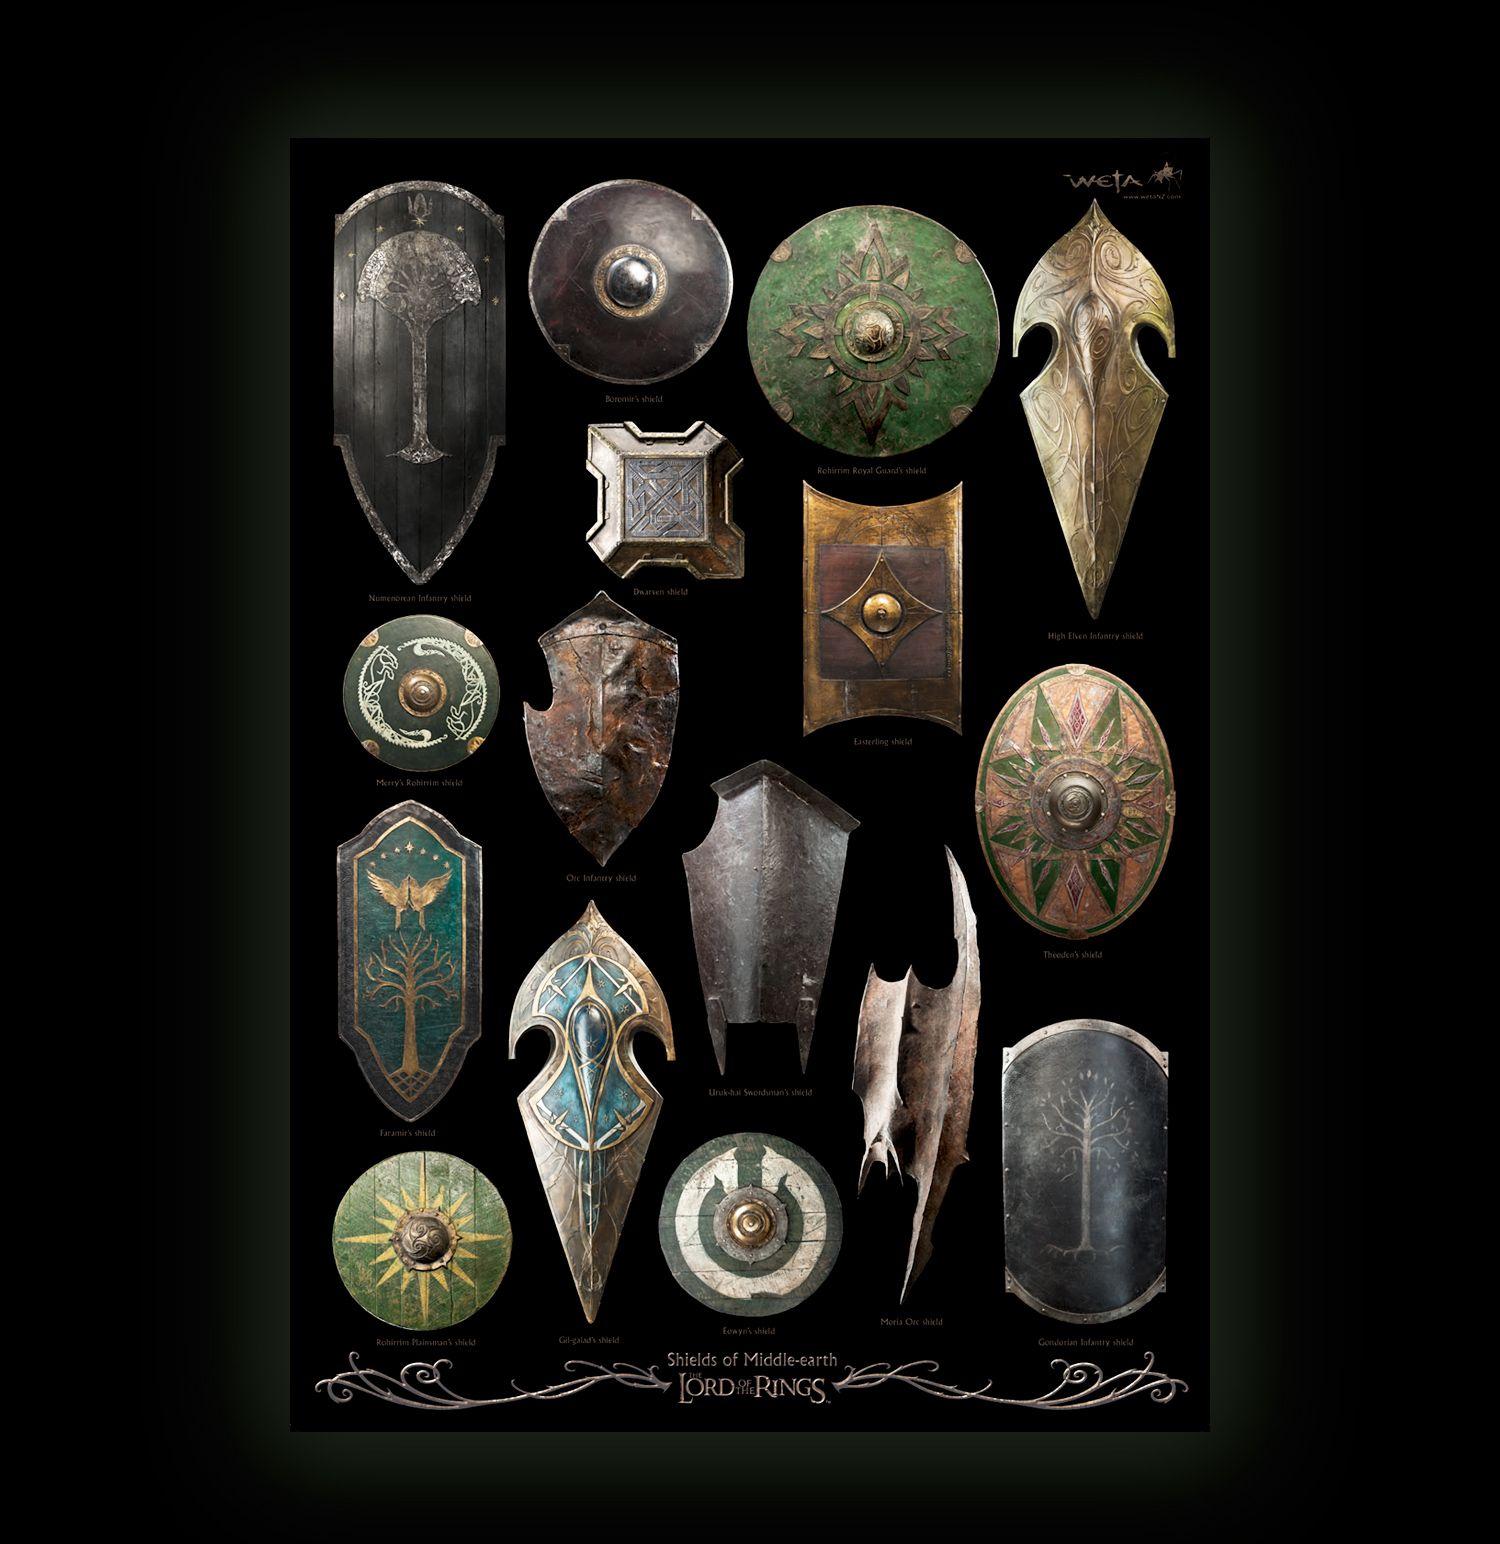 Shields From Lotr Right Then Pinterest Lotr